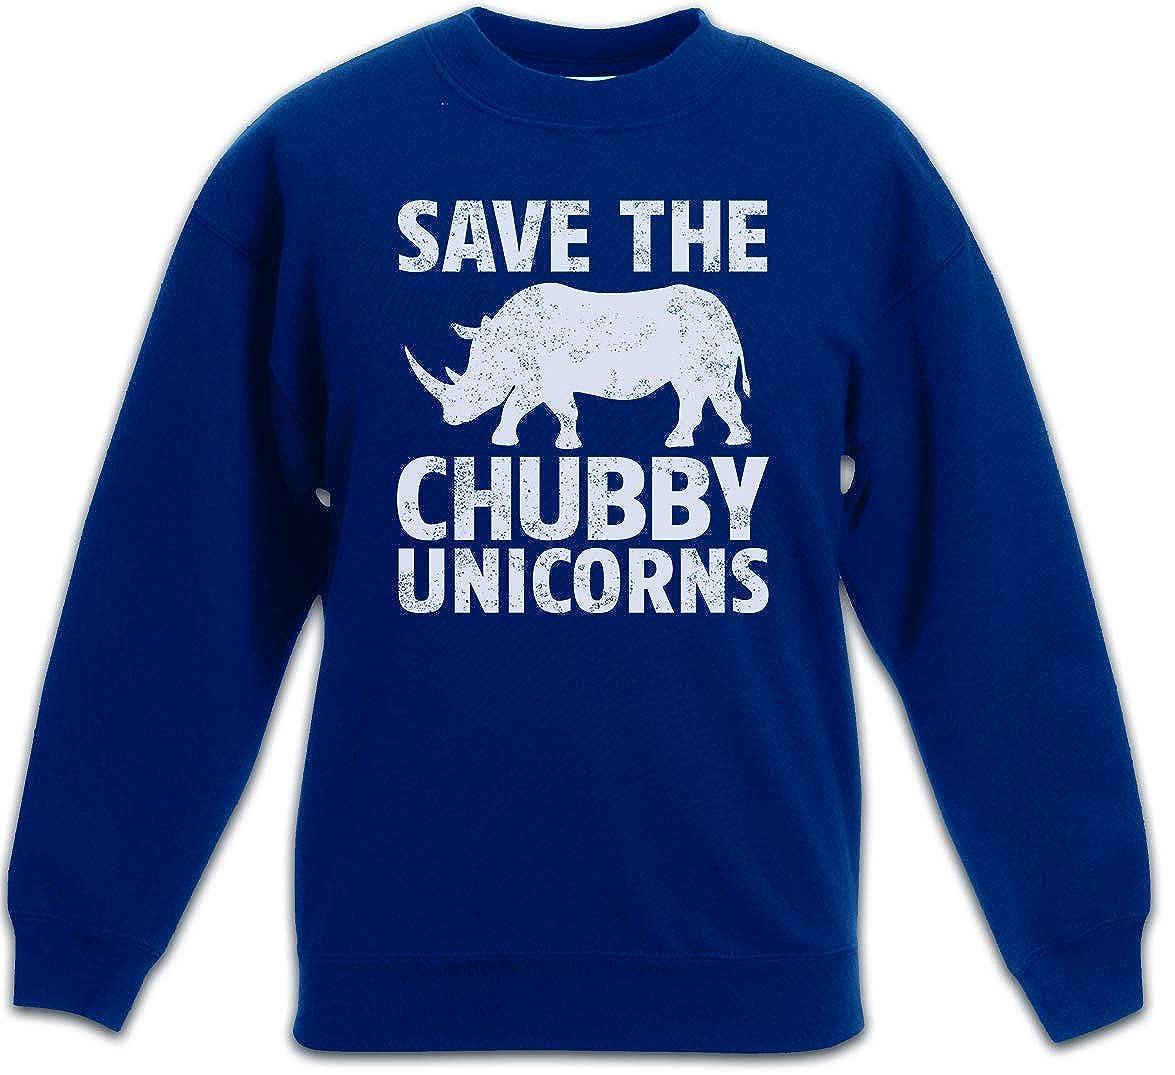 Save The Chubby Unicorns Kids Children Boys Girls Sweatshirt Pullover Nashorn Einhorn Rhino Rainbow Colors Regenbogen Fairy Fairies Elfen The Last Cartoon Rockabella Rockabilly Tattoo Fun